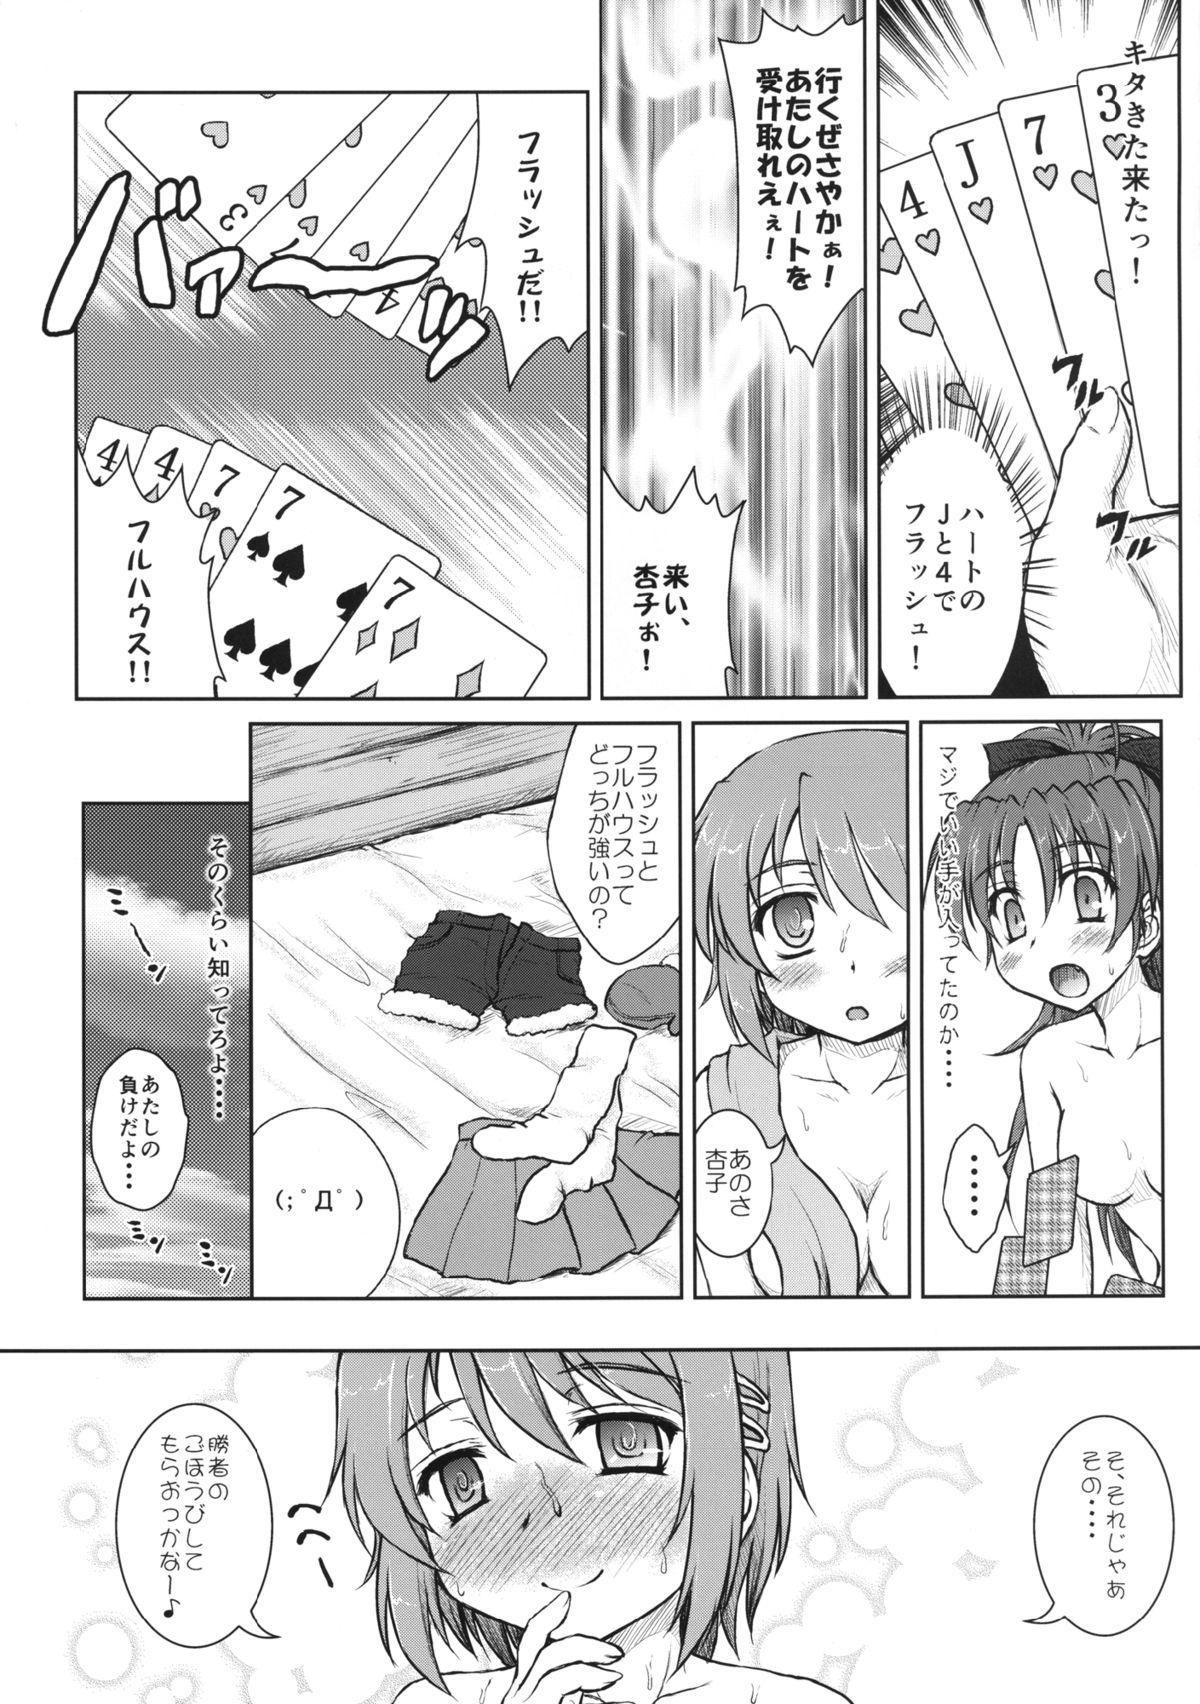 (SHT2013 Haru) [Newtype Kenkyuujo (Kotowari)] Sayaka-san to Kyouko-san (Puella Magi Madoka Magica) 26